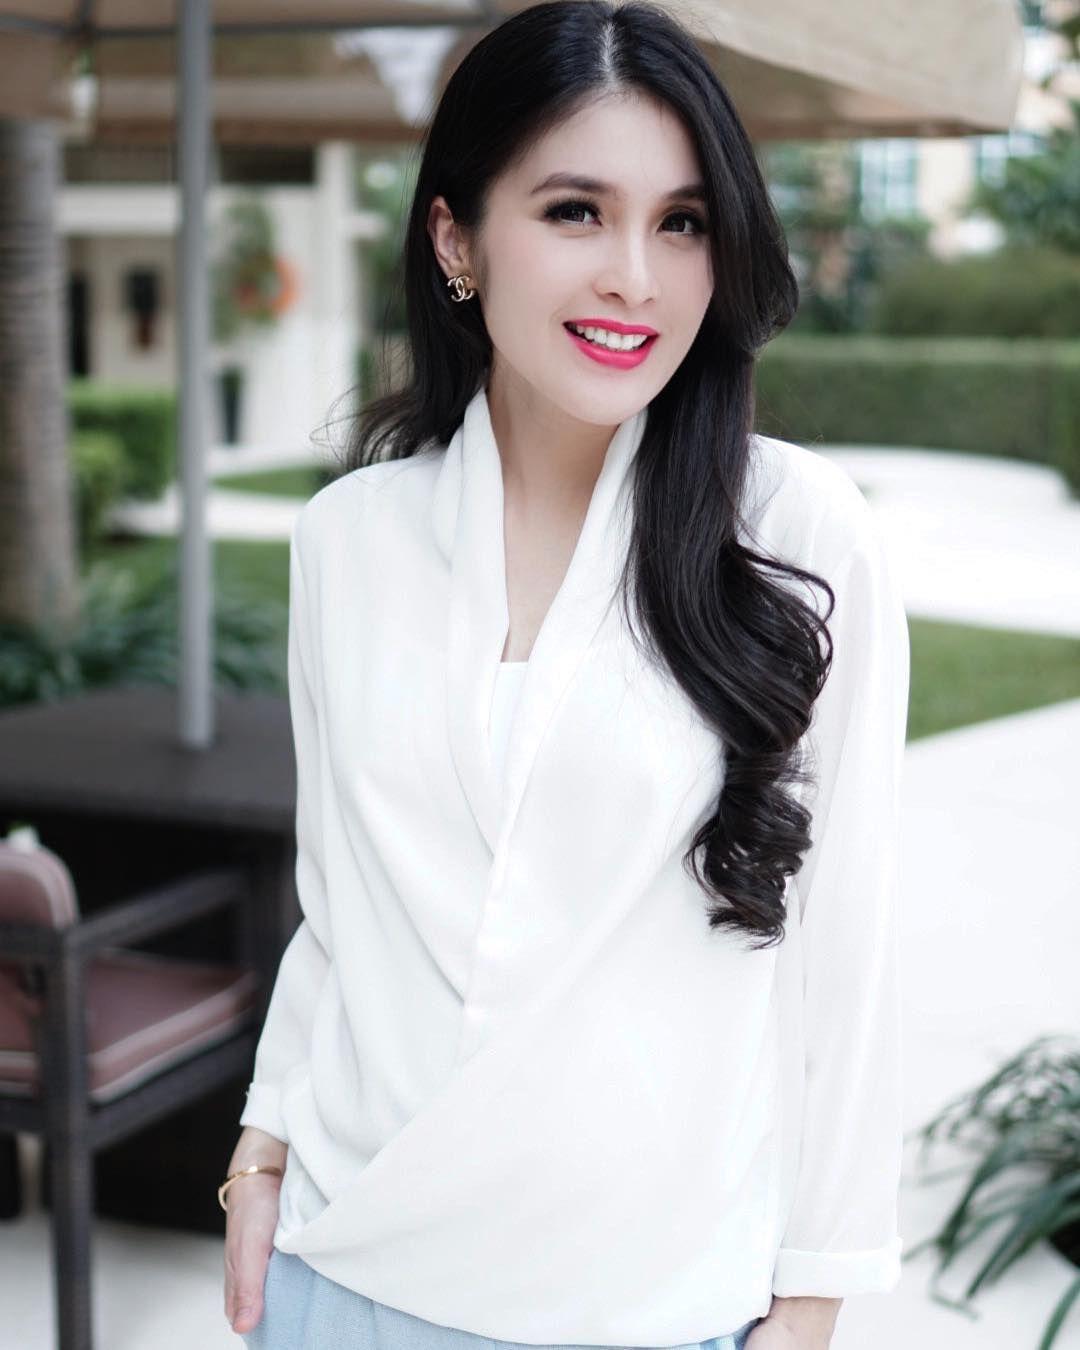 Sandra Dewi nudes (15 pics), video Boobs, iCloud, cleavage 2018